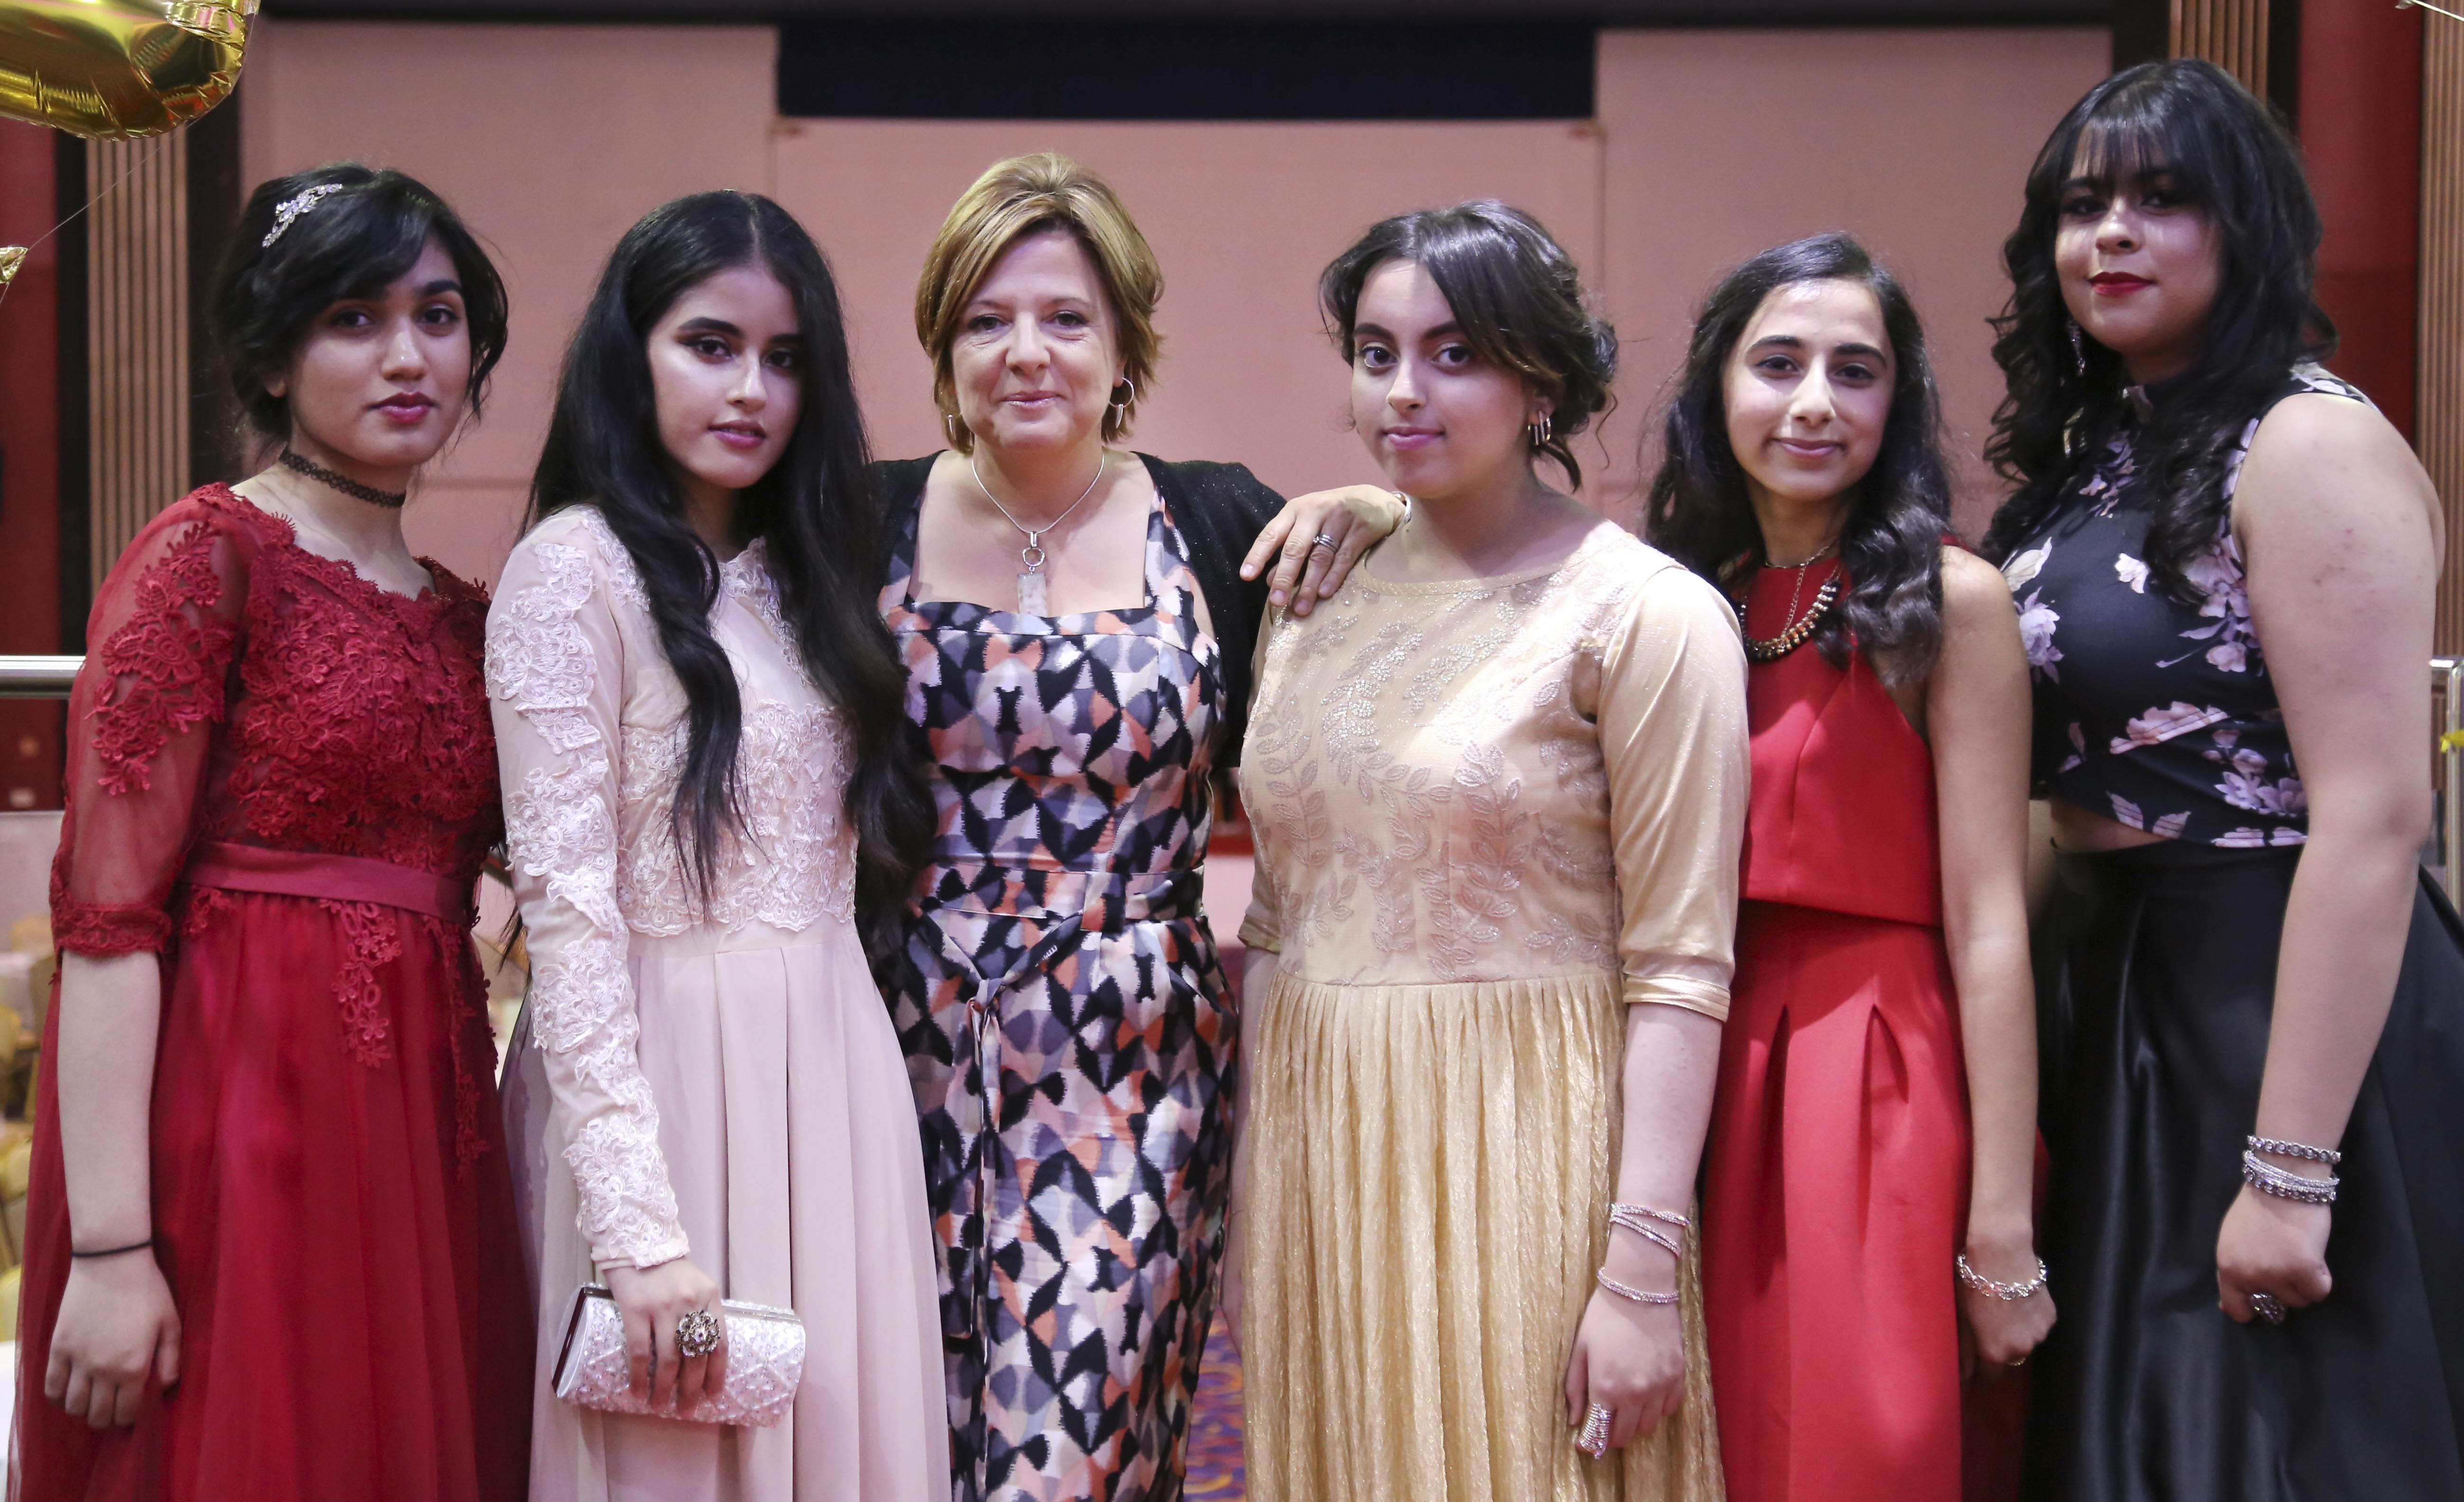 Rabia Naveed, Aminah Tassawar, Ms Morgan, Annam Hassan, Meera Trivedi and Zara Pervaiz 11G 3-edit